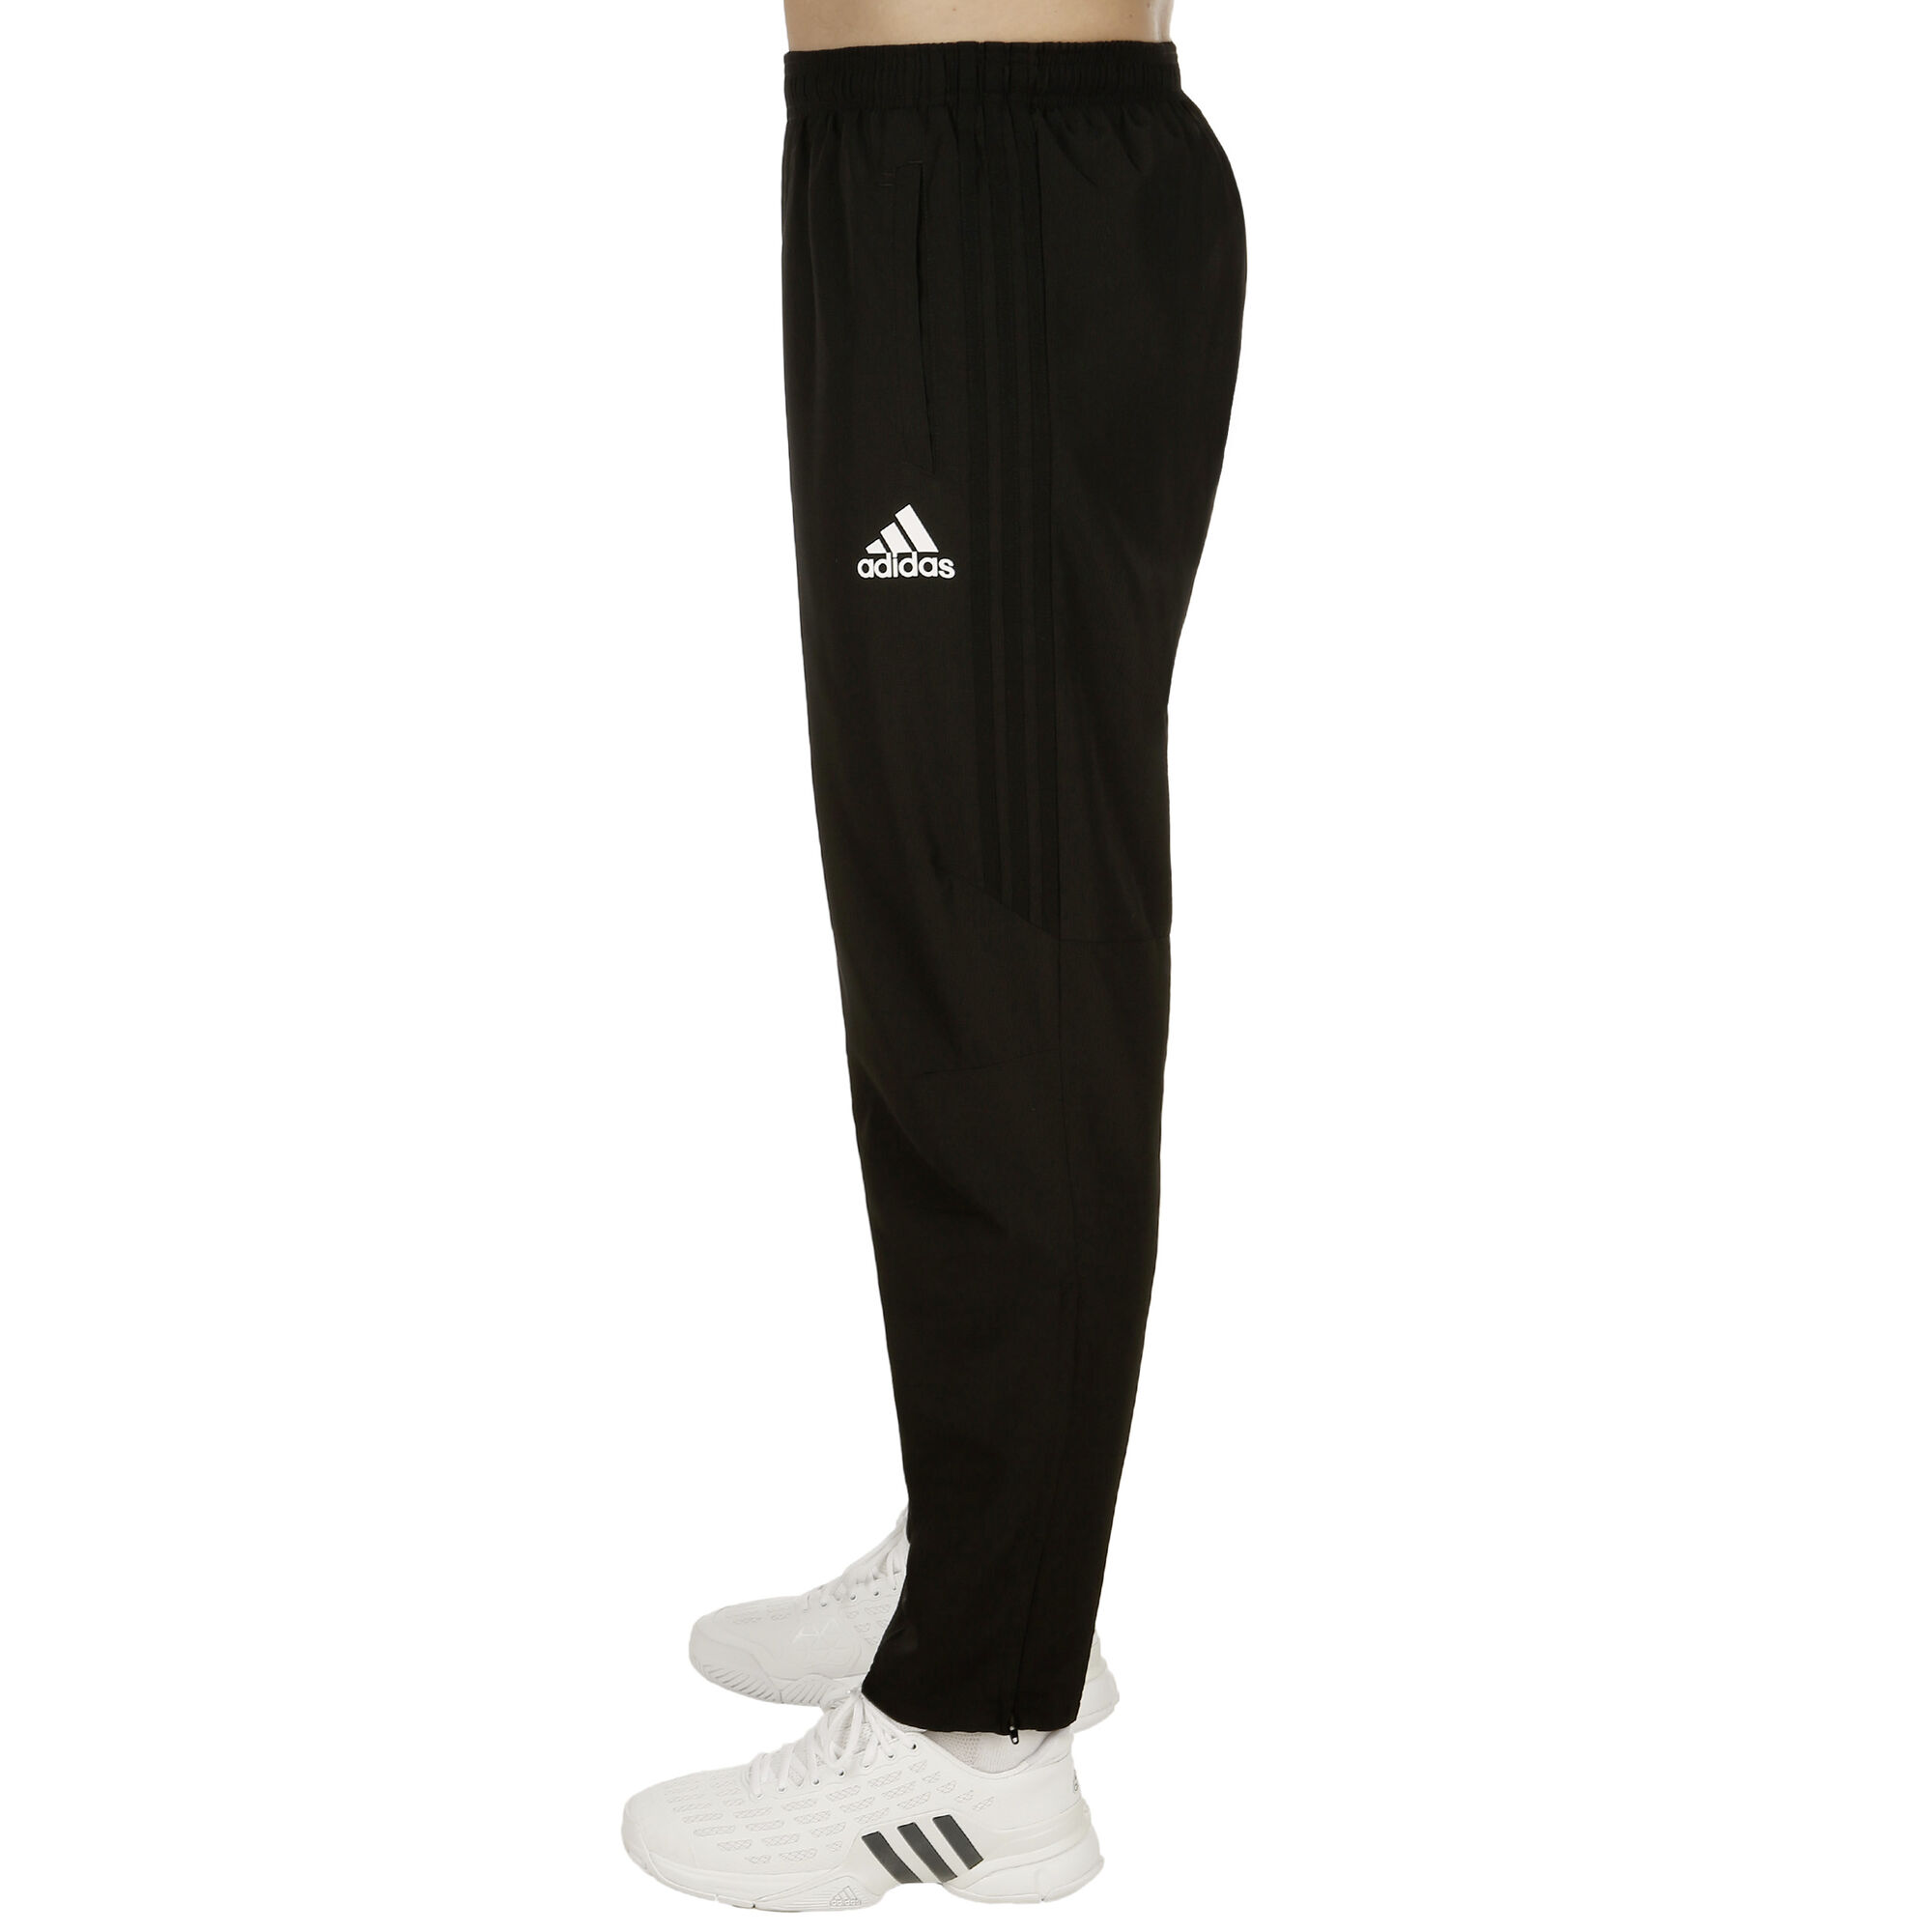 972b16ab968 adidas; adidas; adidas; adidas; adidas; adidas; adidas; adidas; adidas;  adidas; adidas. Tiro 17 Woven Pant Men ...